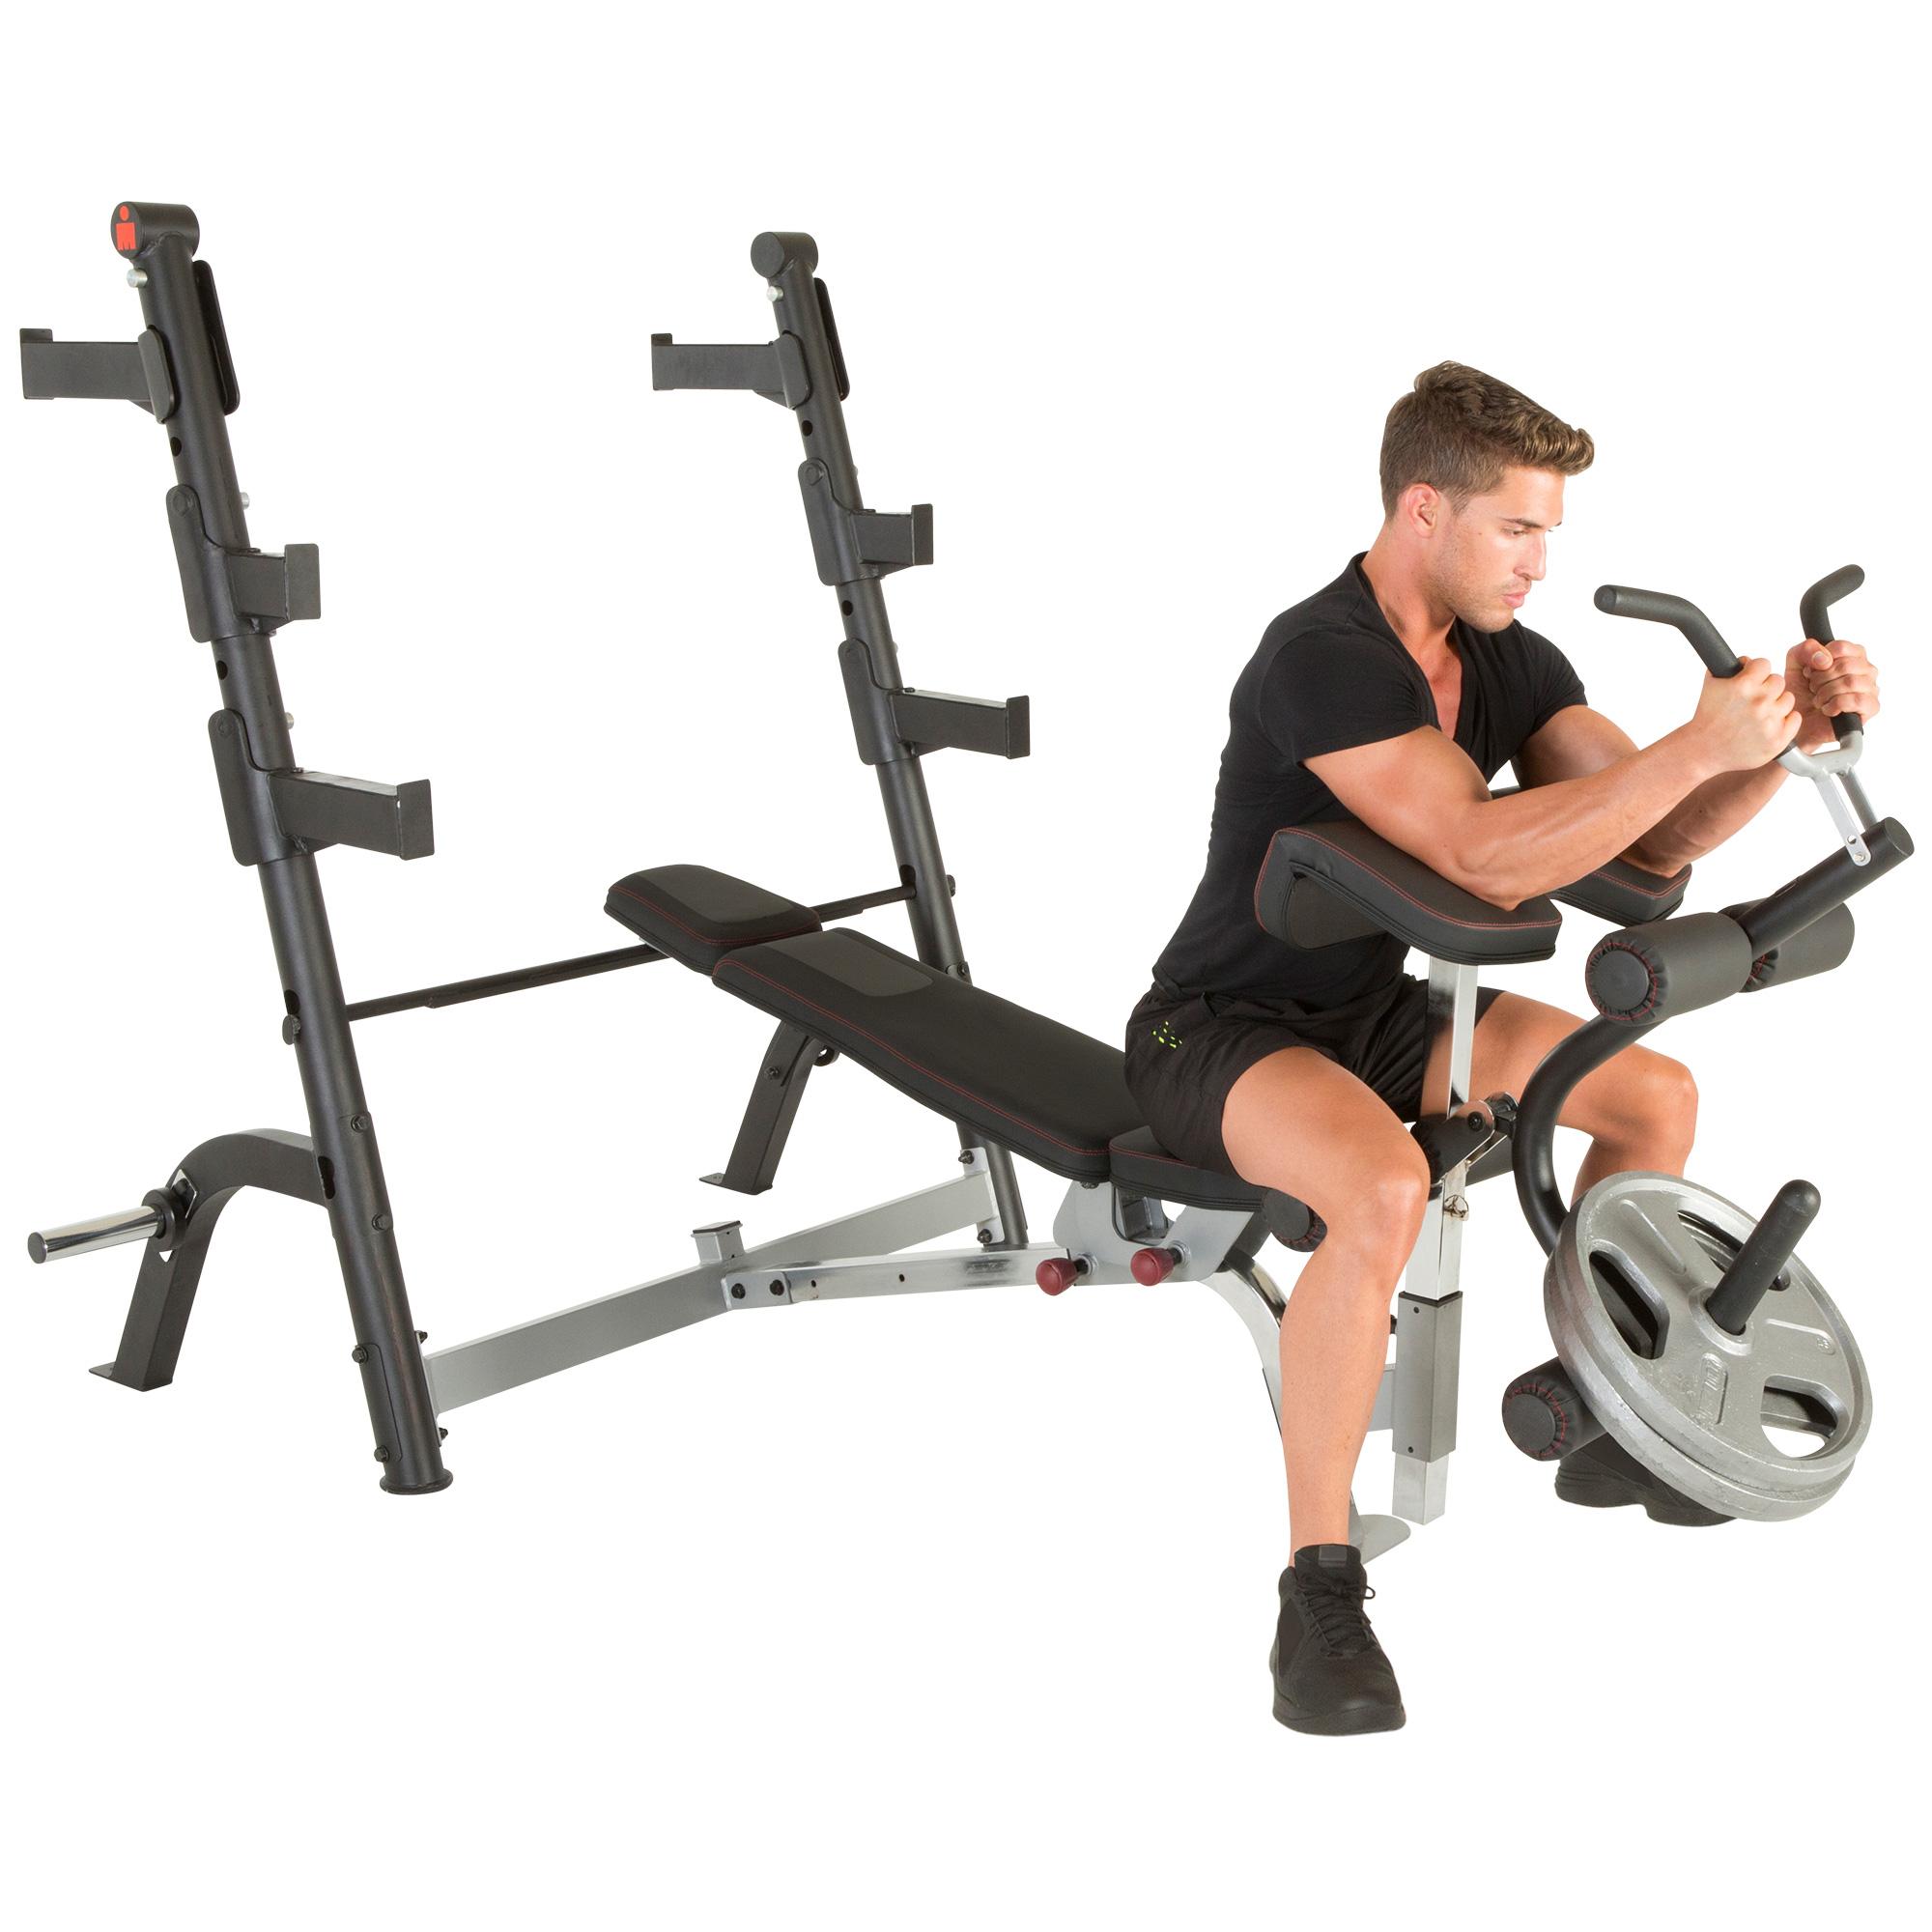 Ironman X Class Weight Bench With Preacher Curl And Leg